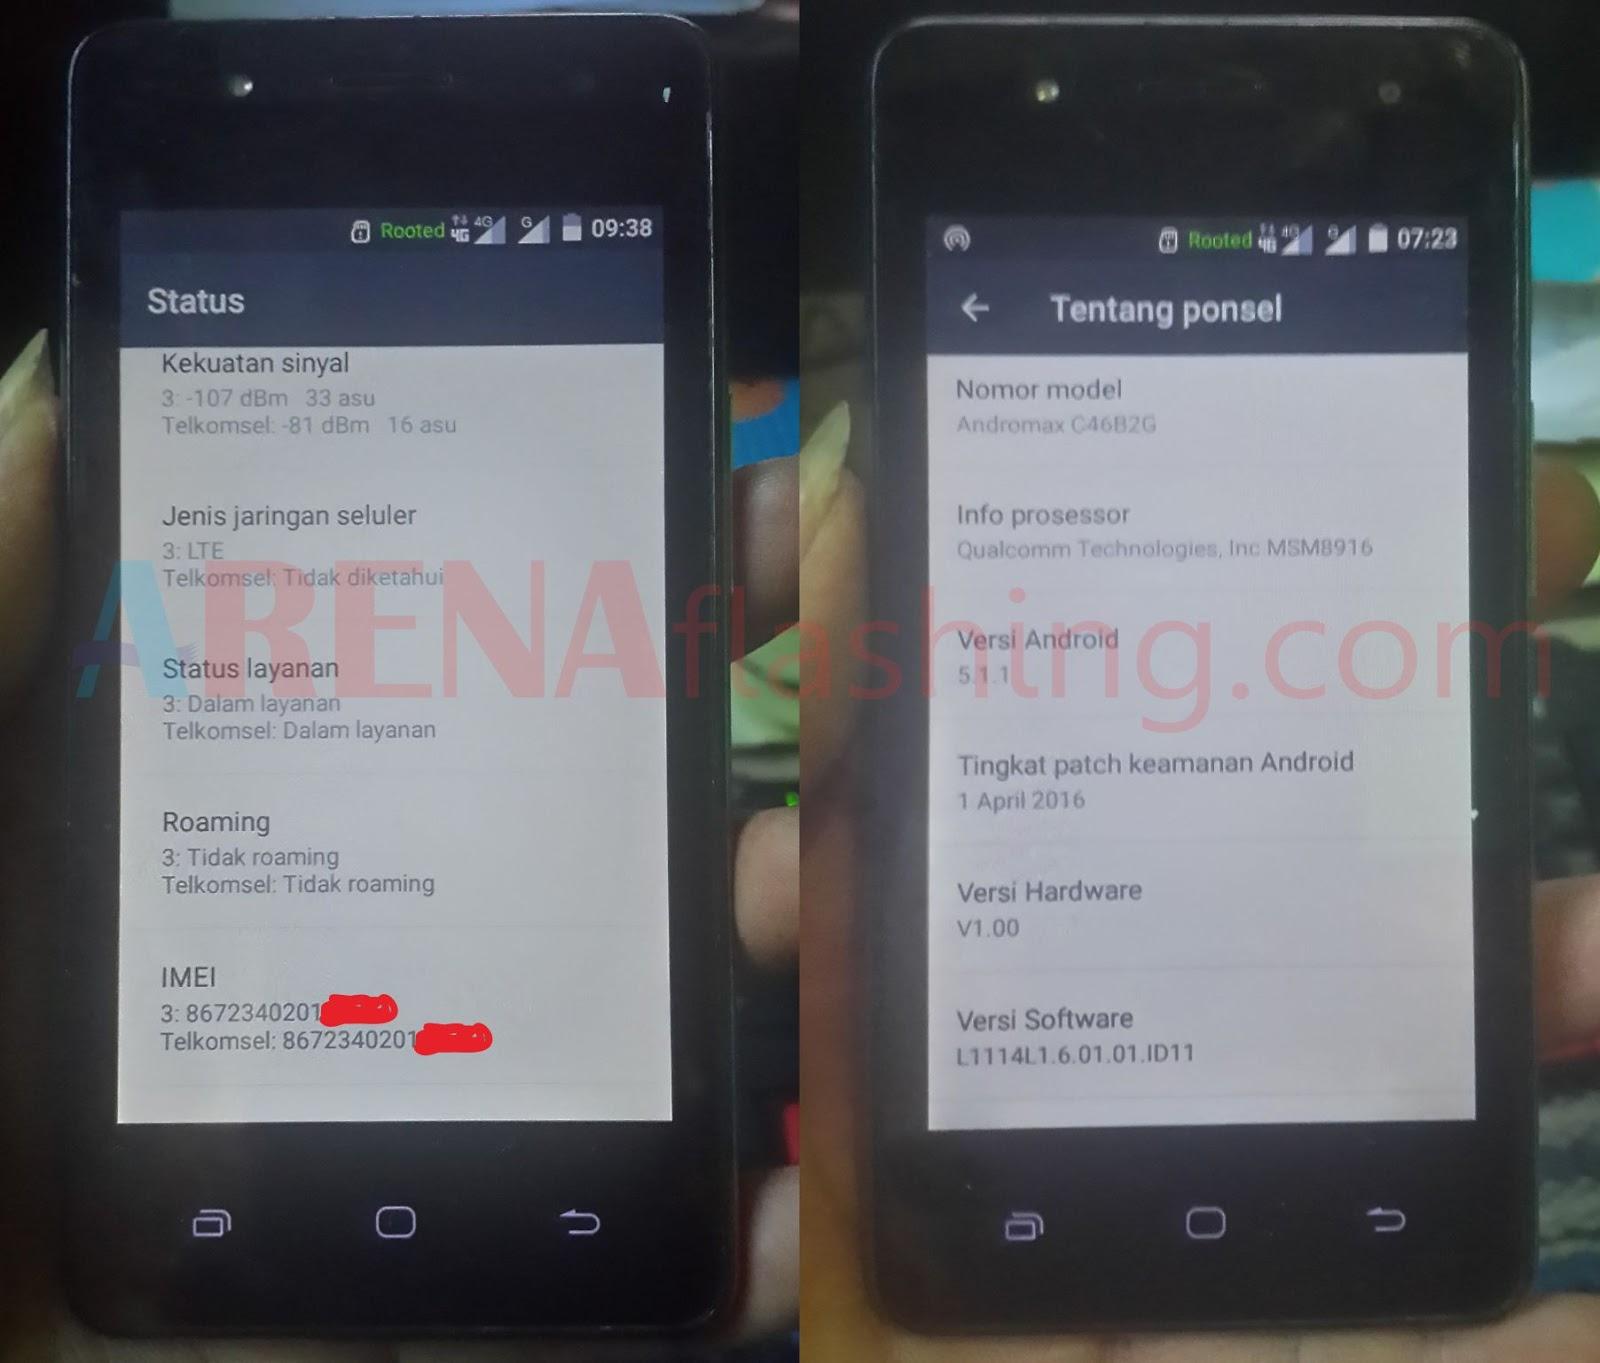 Tutorial Dual Gsm 4g Andromax Es C46b2g Tanpa Pc Tutorial Flashing Android Upgrade Downgrade Firmware Unbrick